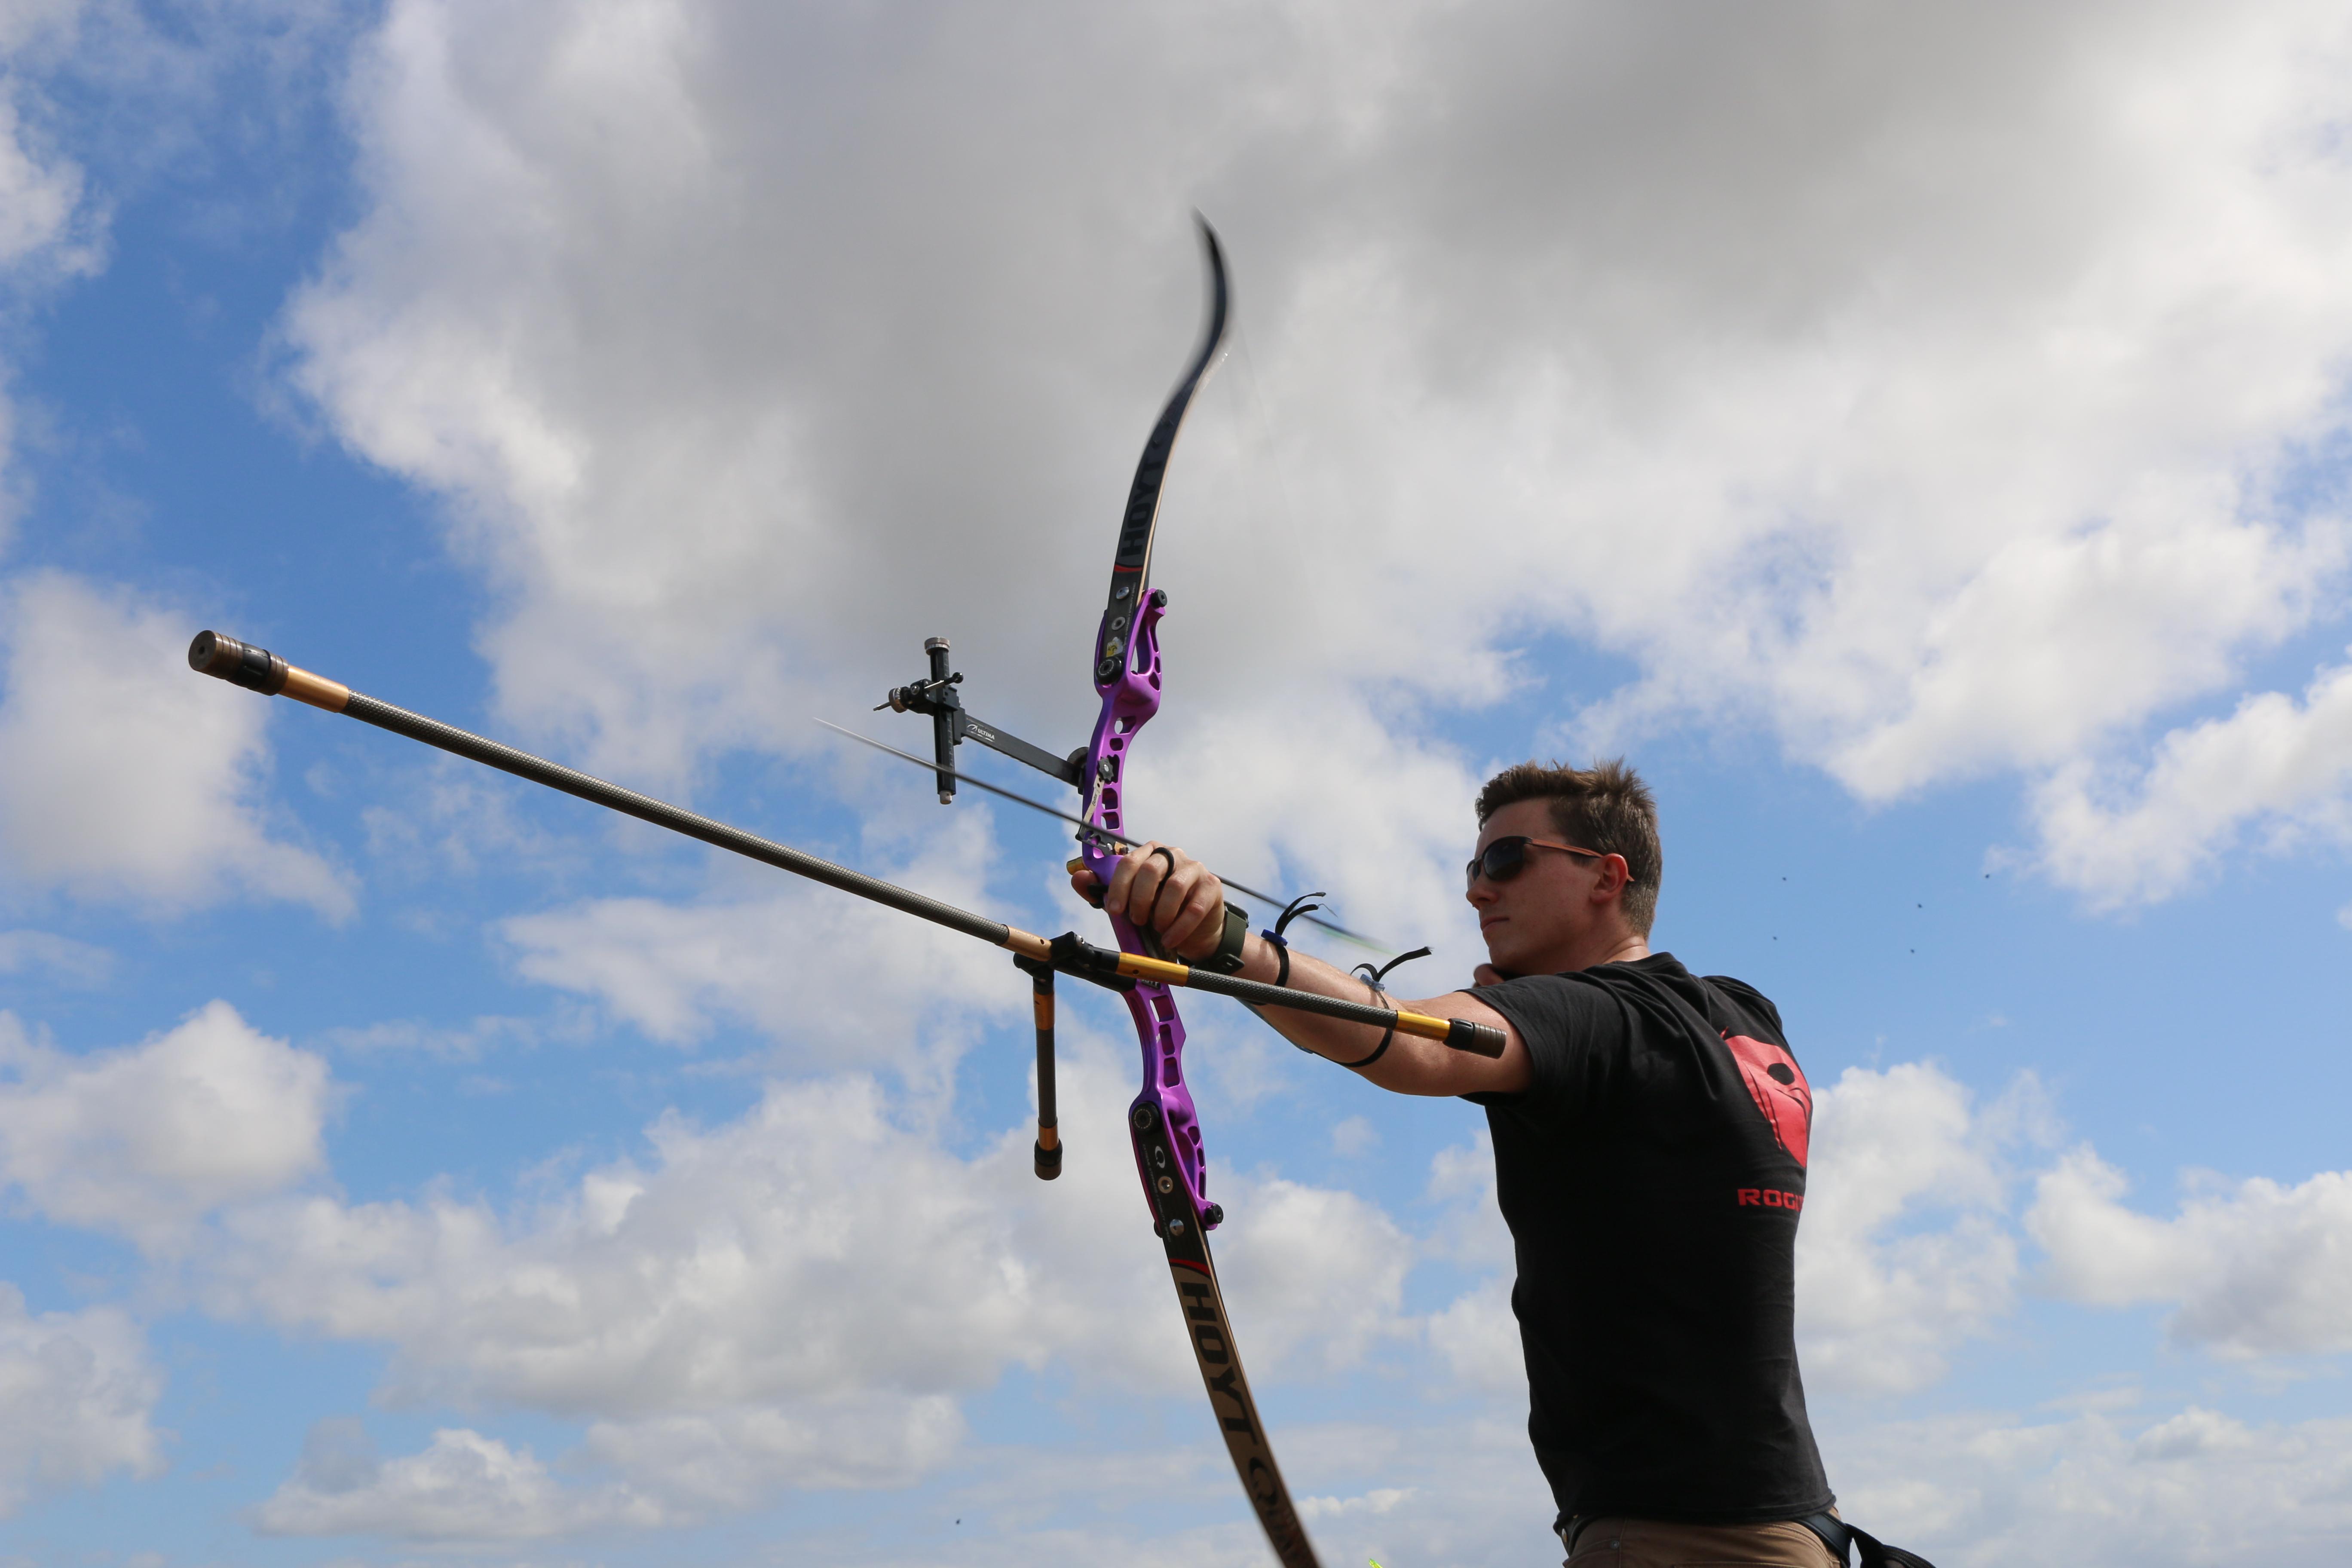 Recurve archery technique fundamentals online coaching course olympic archery coaching rogue archery